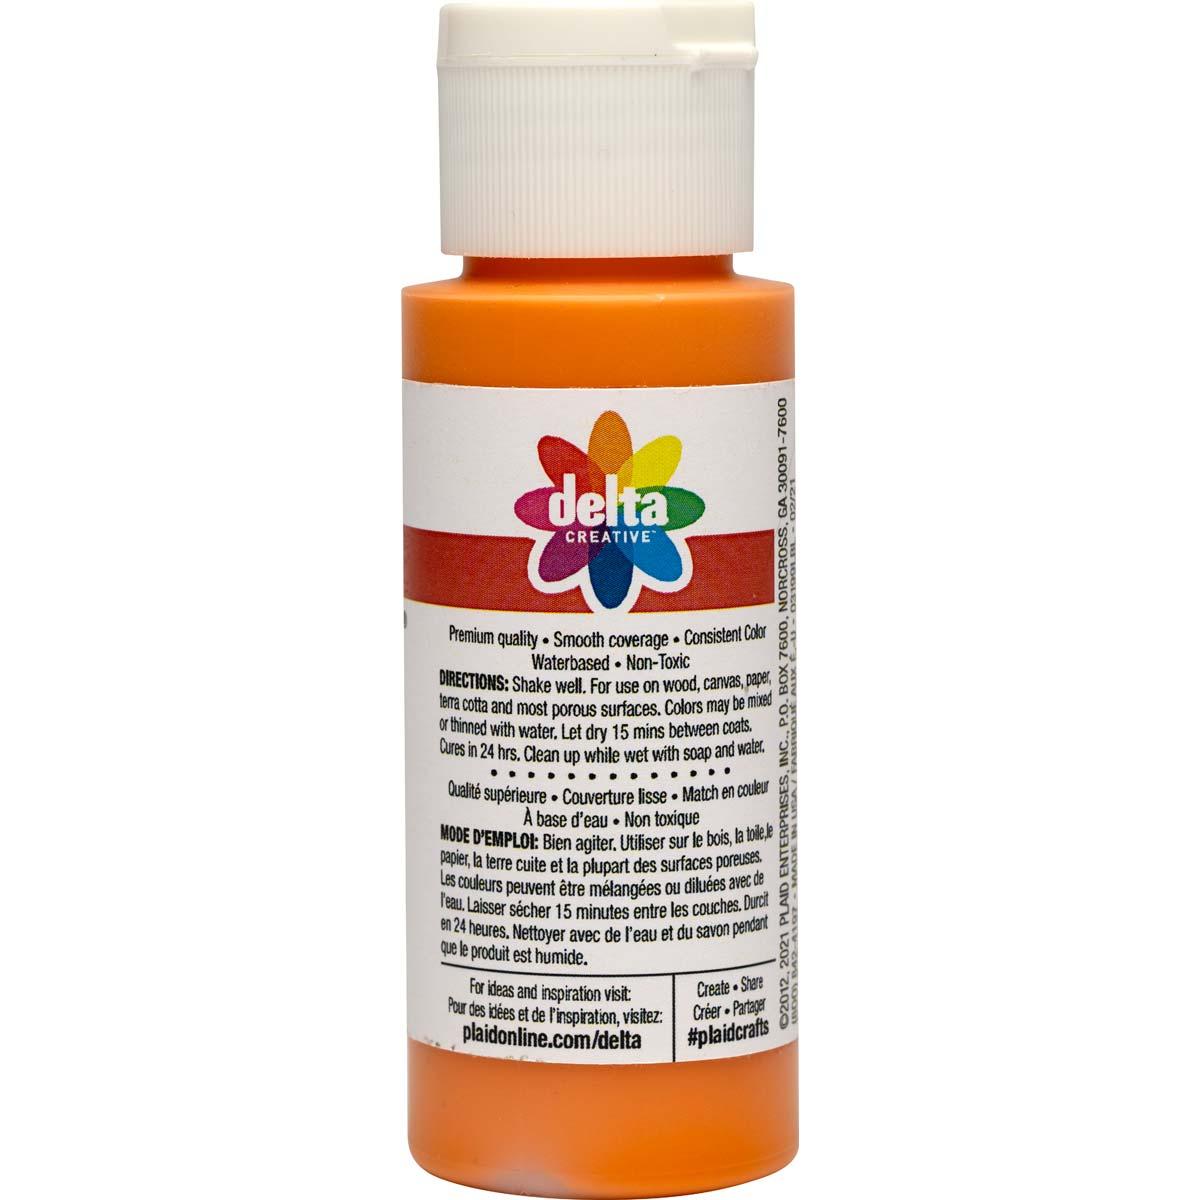 Delta Ceramcoat Acrylic Paint - Amber Glow, 2 oz. - 03199